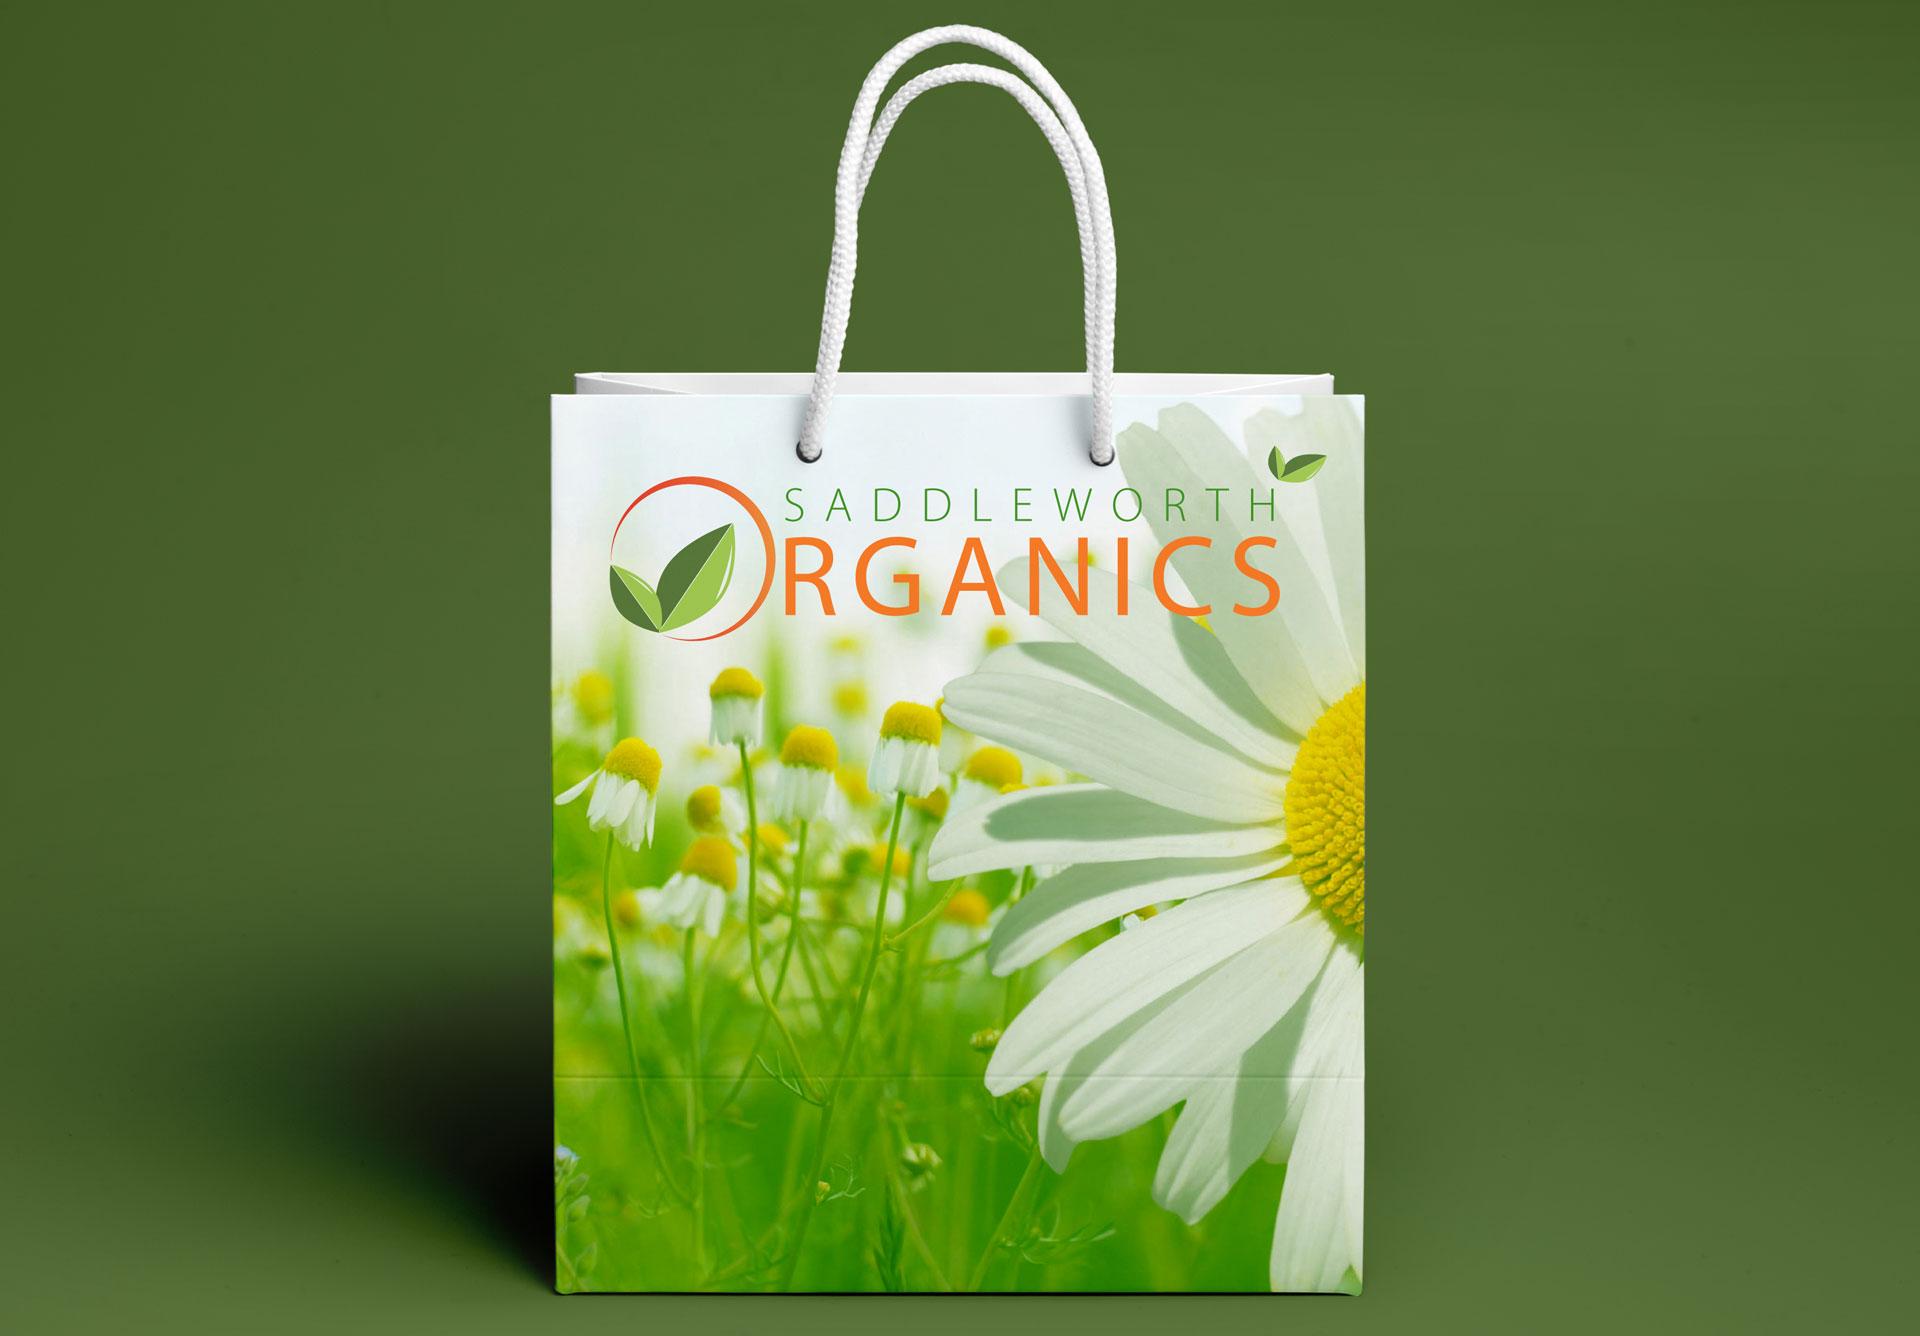 Saddleworth Organics